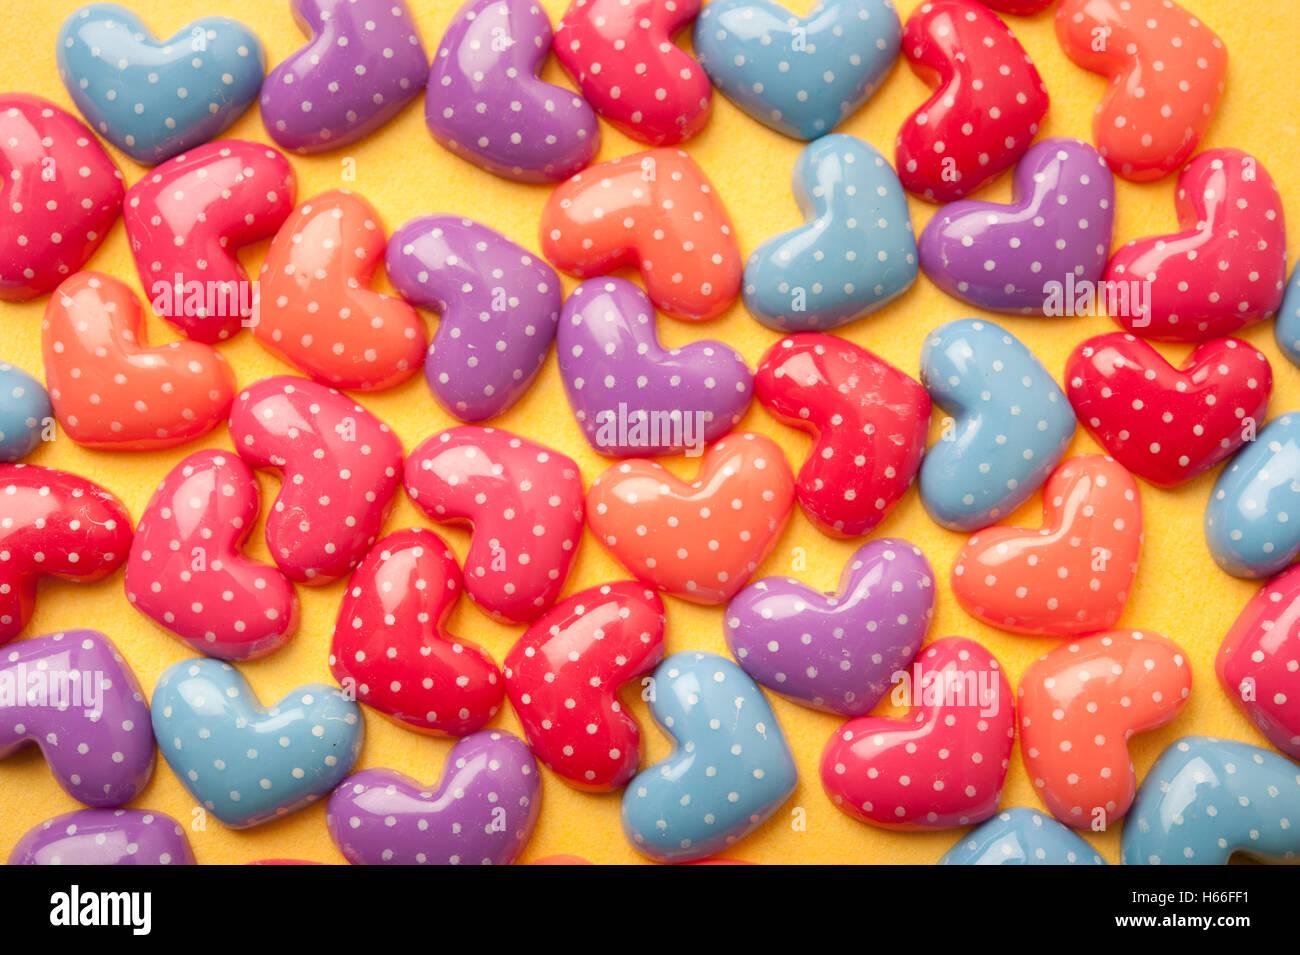 colorful heart shaped confetti, love concept - Stock Image